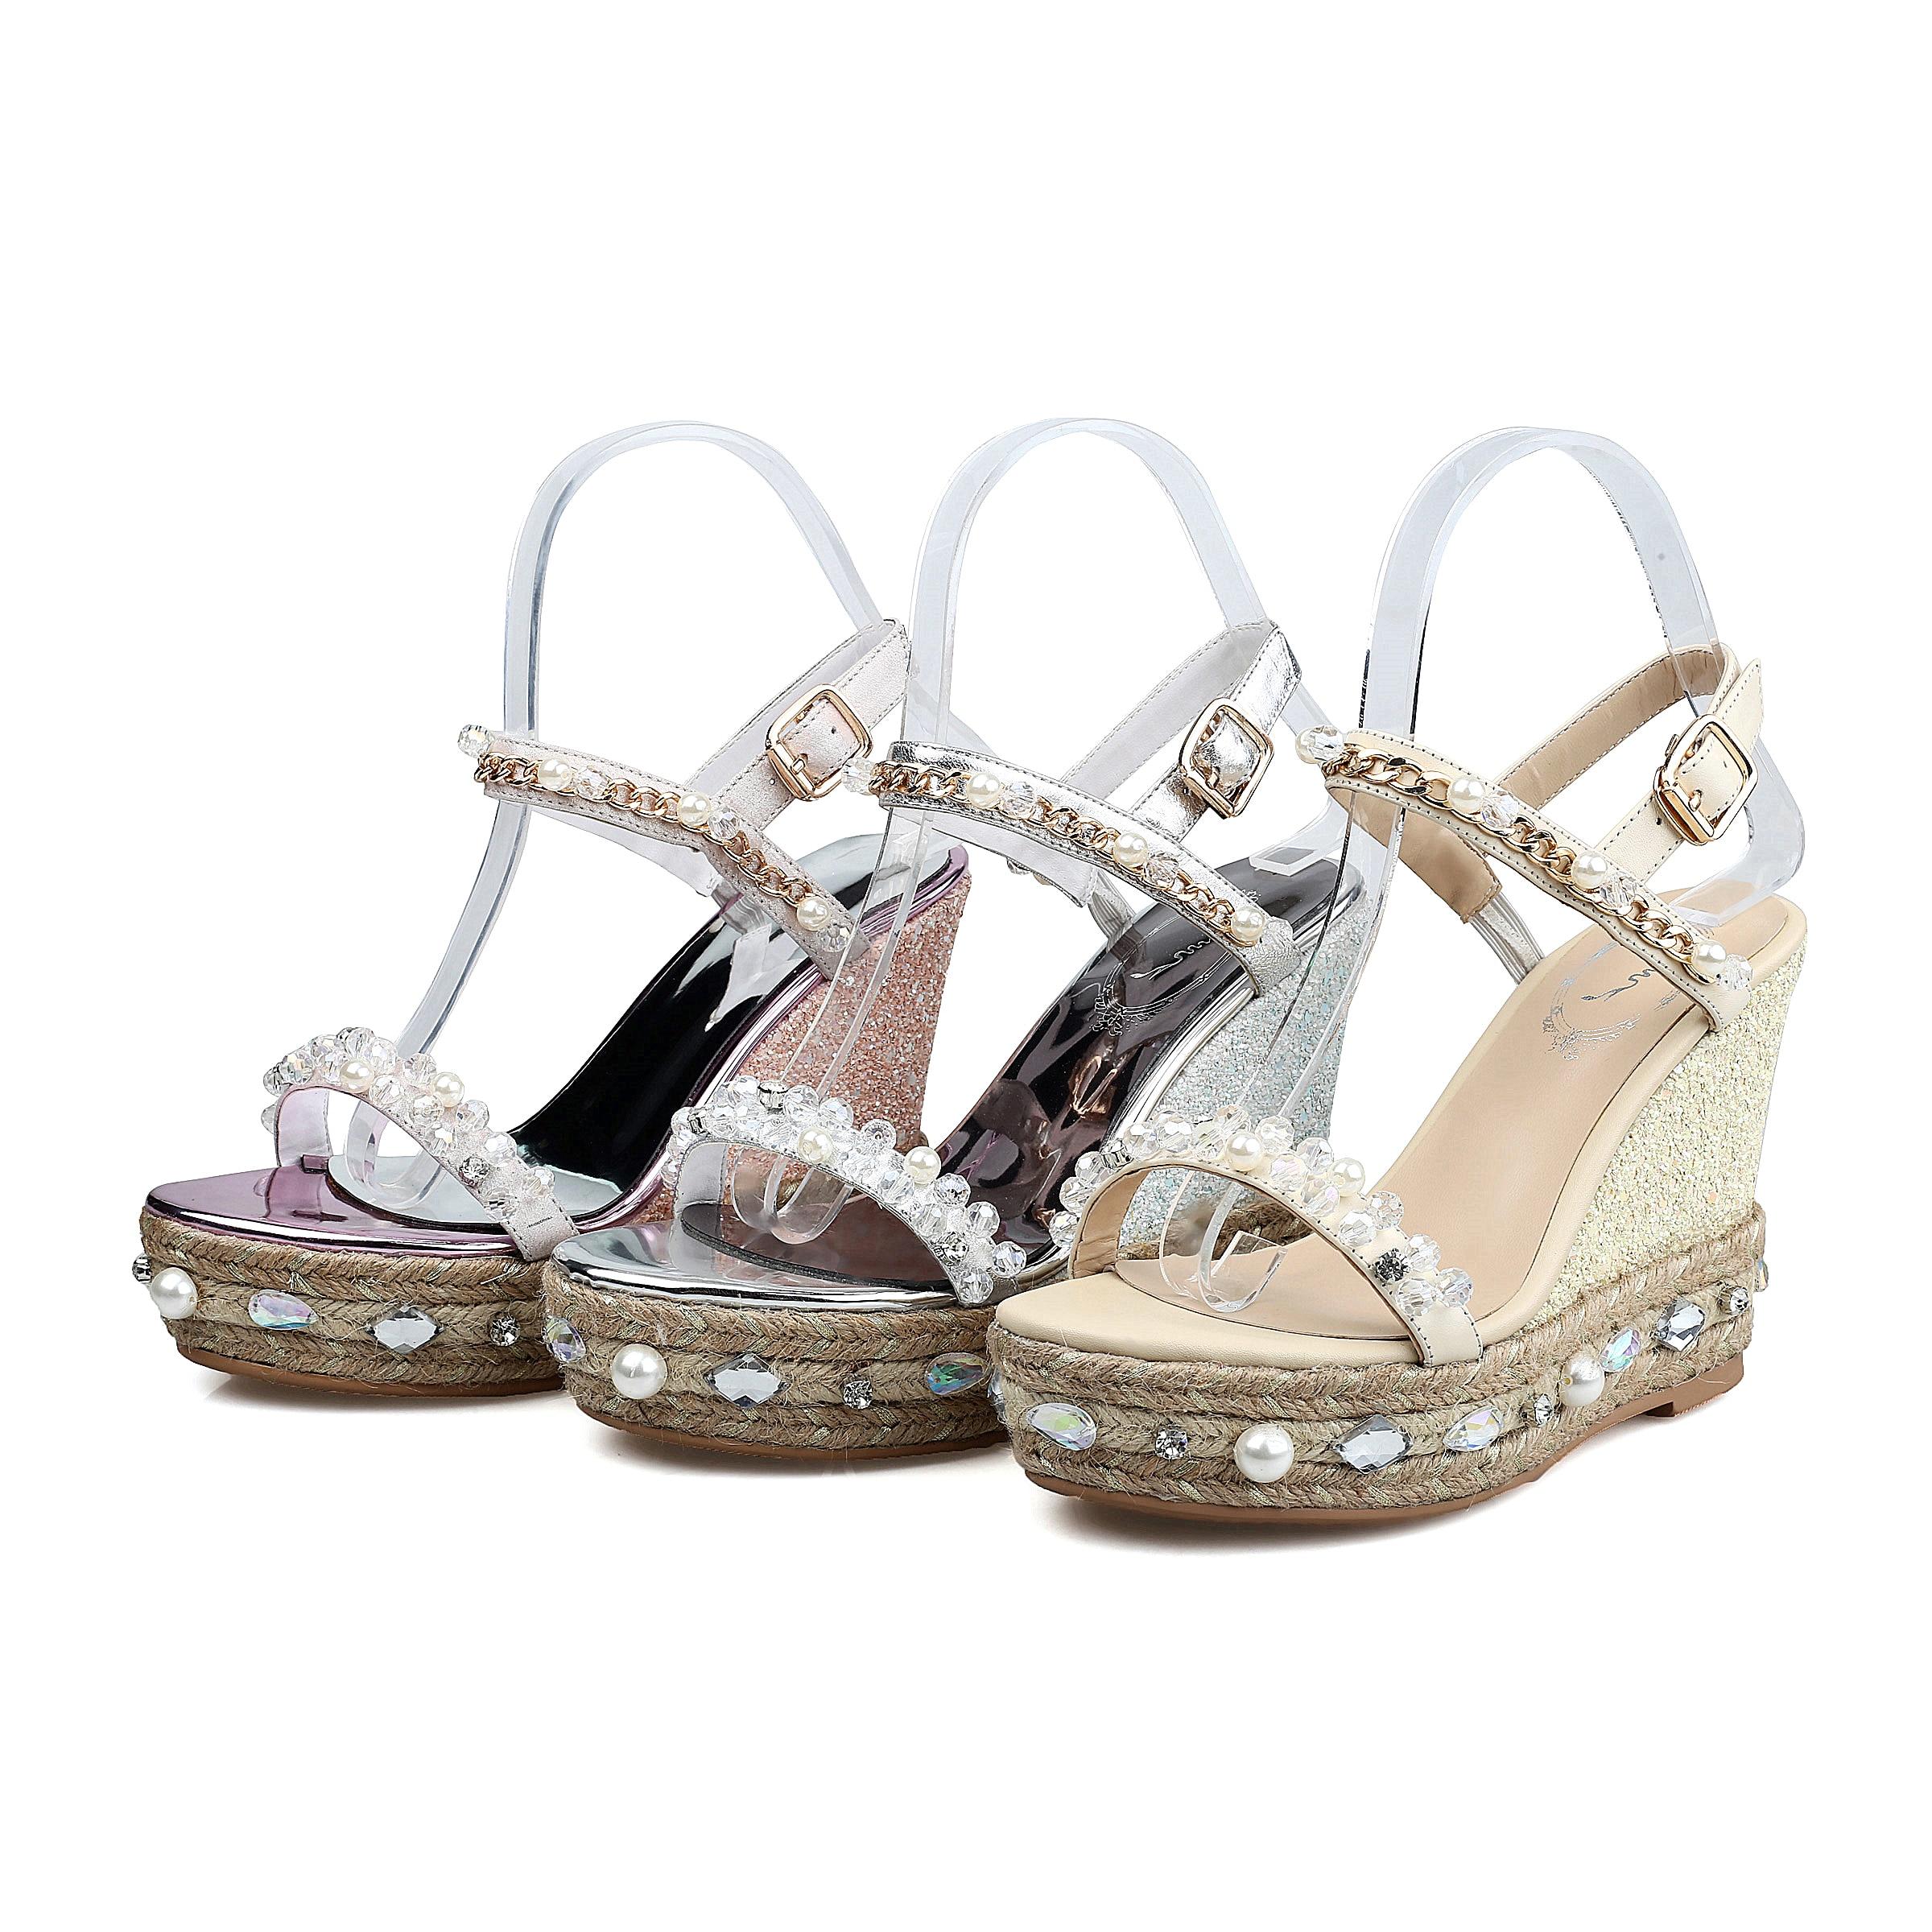 De Rose Ruban Chaussures Doratasia Sandales Véritable Sanda pqSVUzM